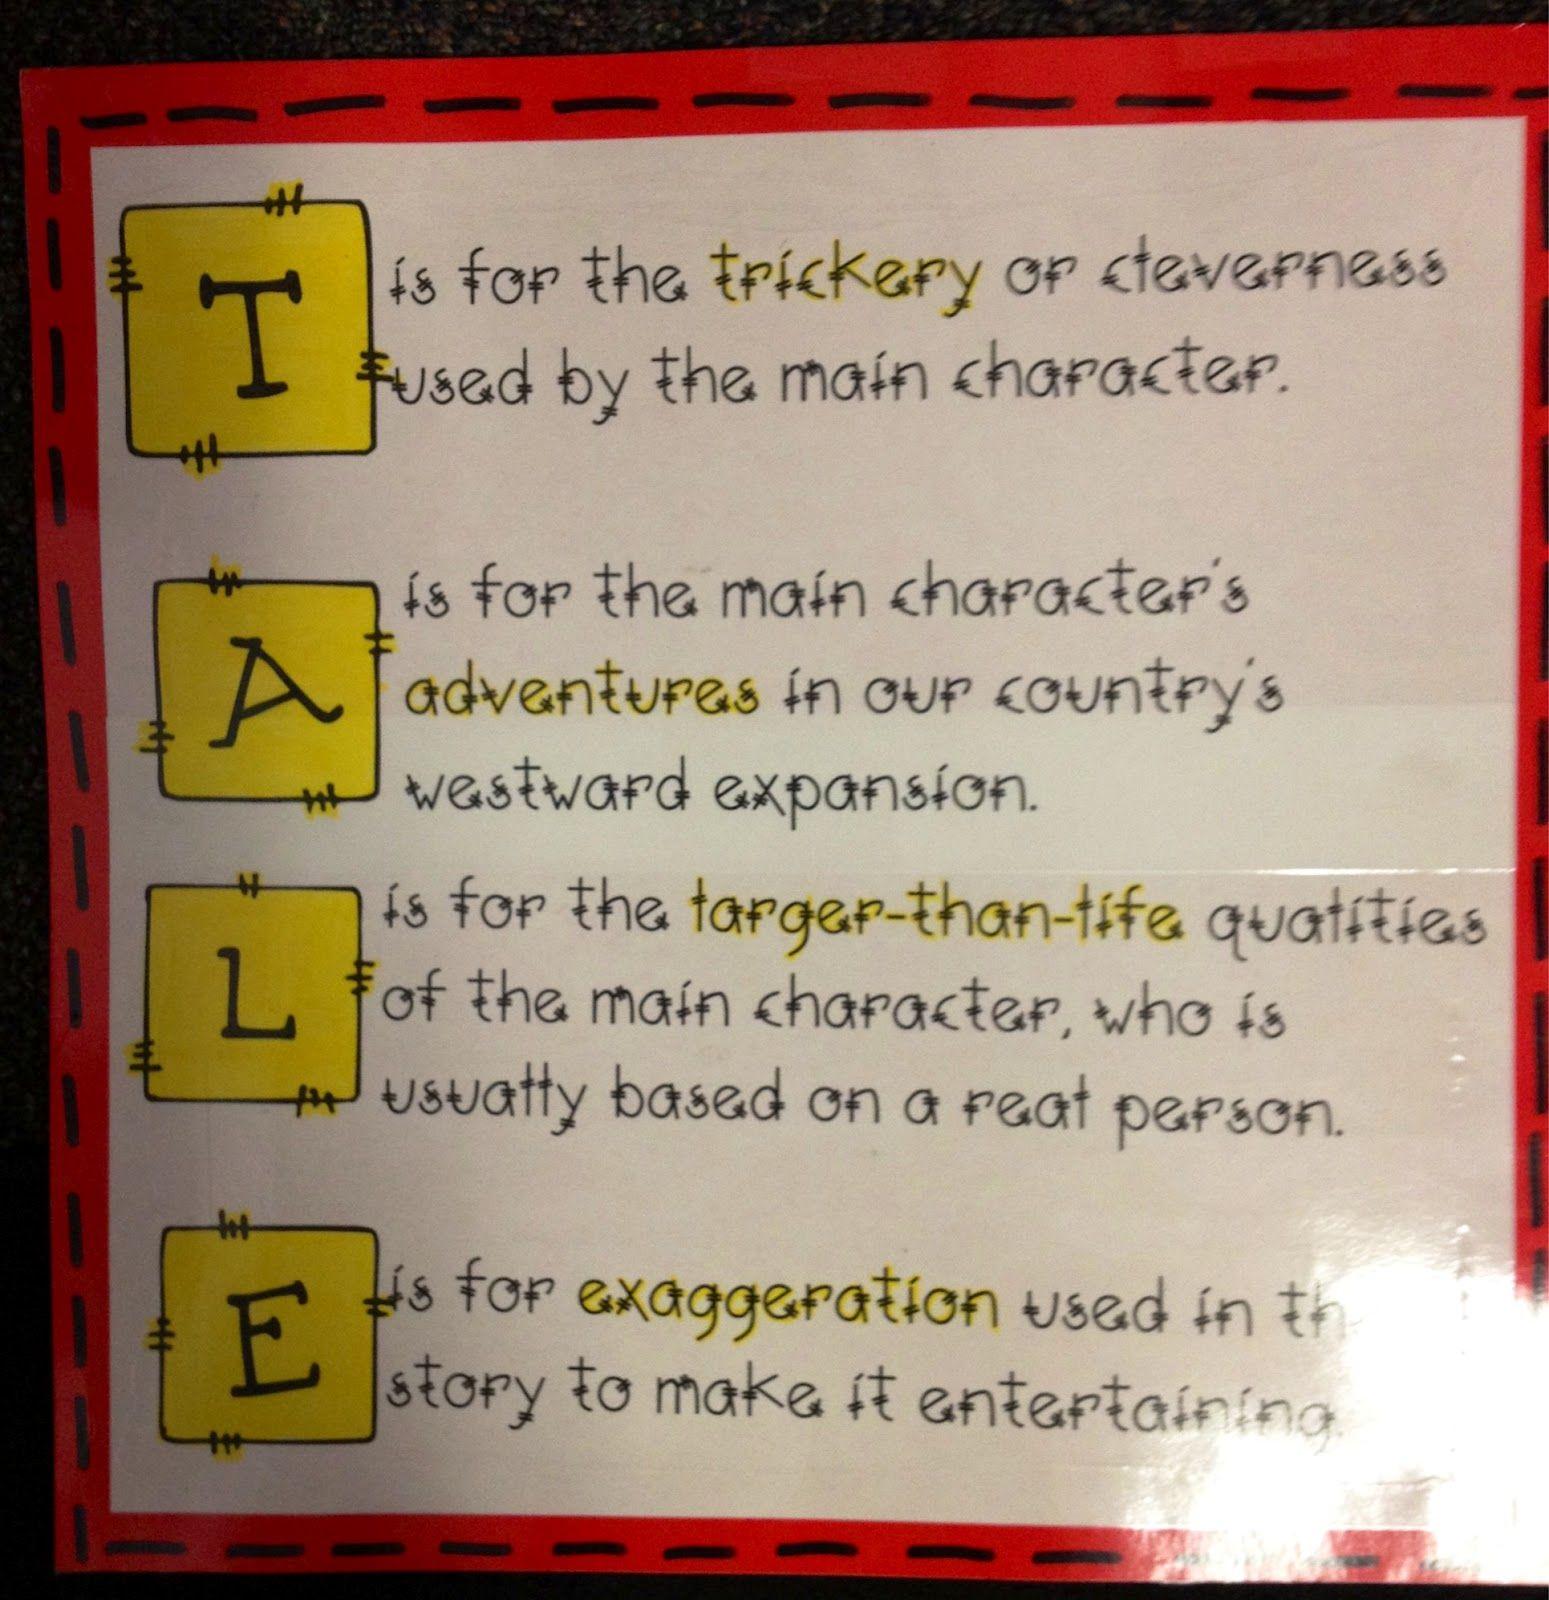 tall tale Characteristics Chart | Classroom Anchor Charts